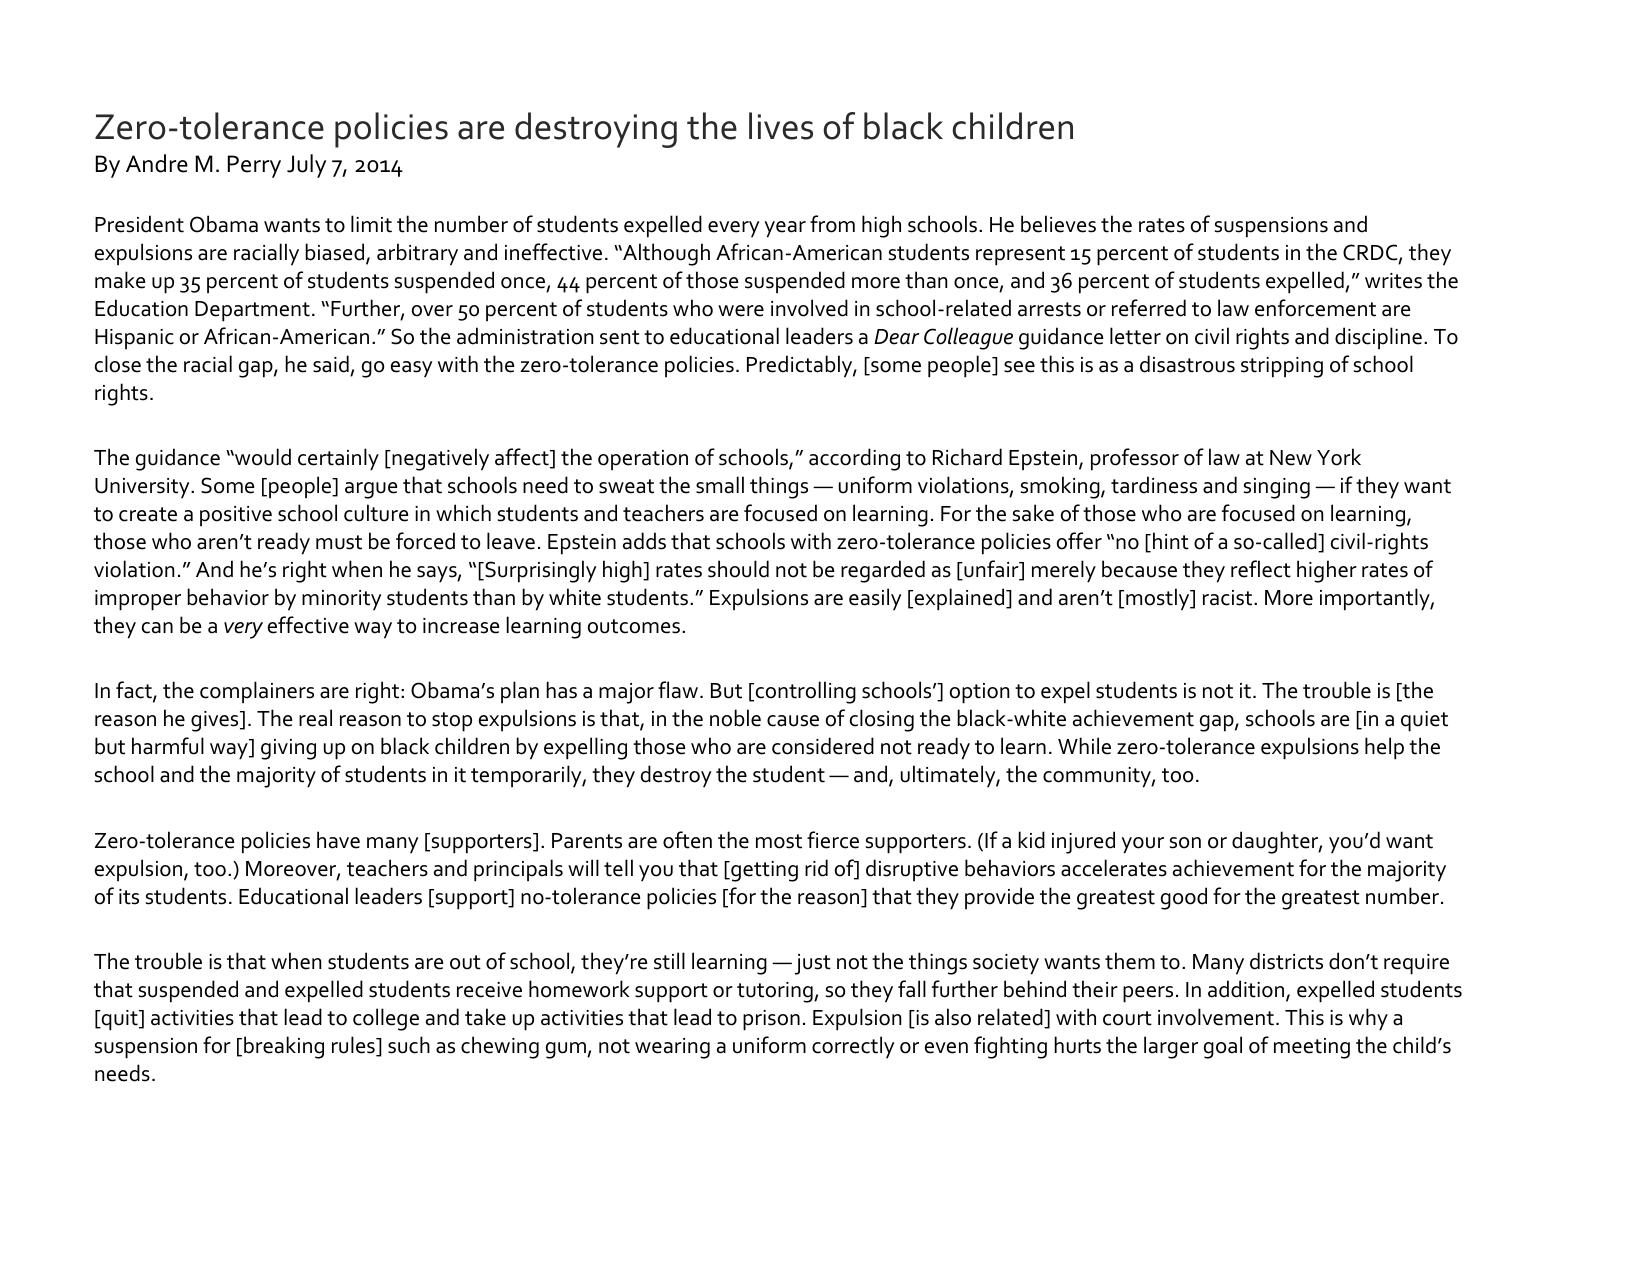 Zero Tolerance Policies Are Destroying >> Zero Tolerance Policies Are Destroying The Lives Of Black Children By